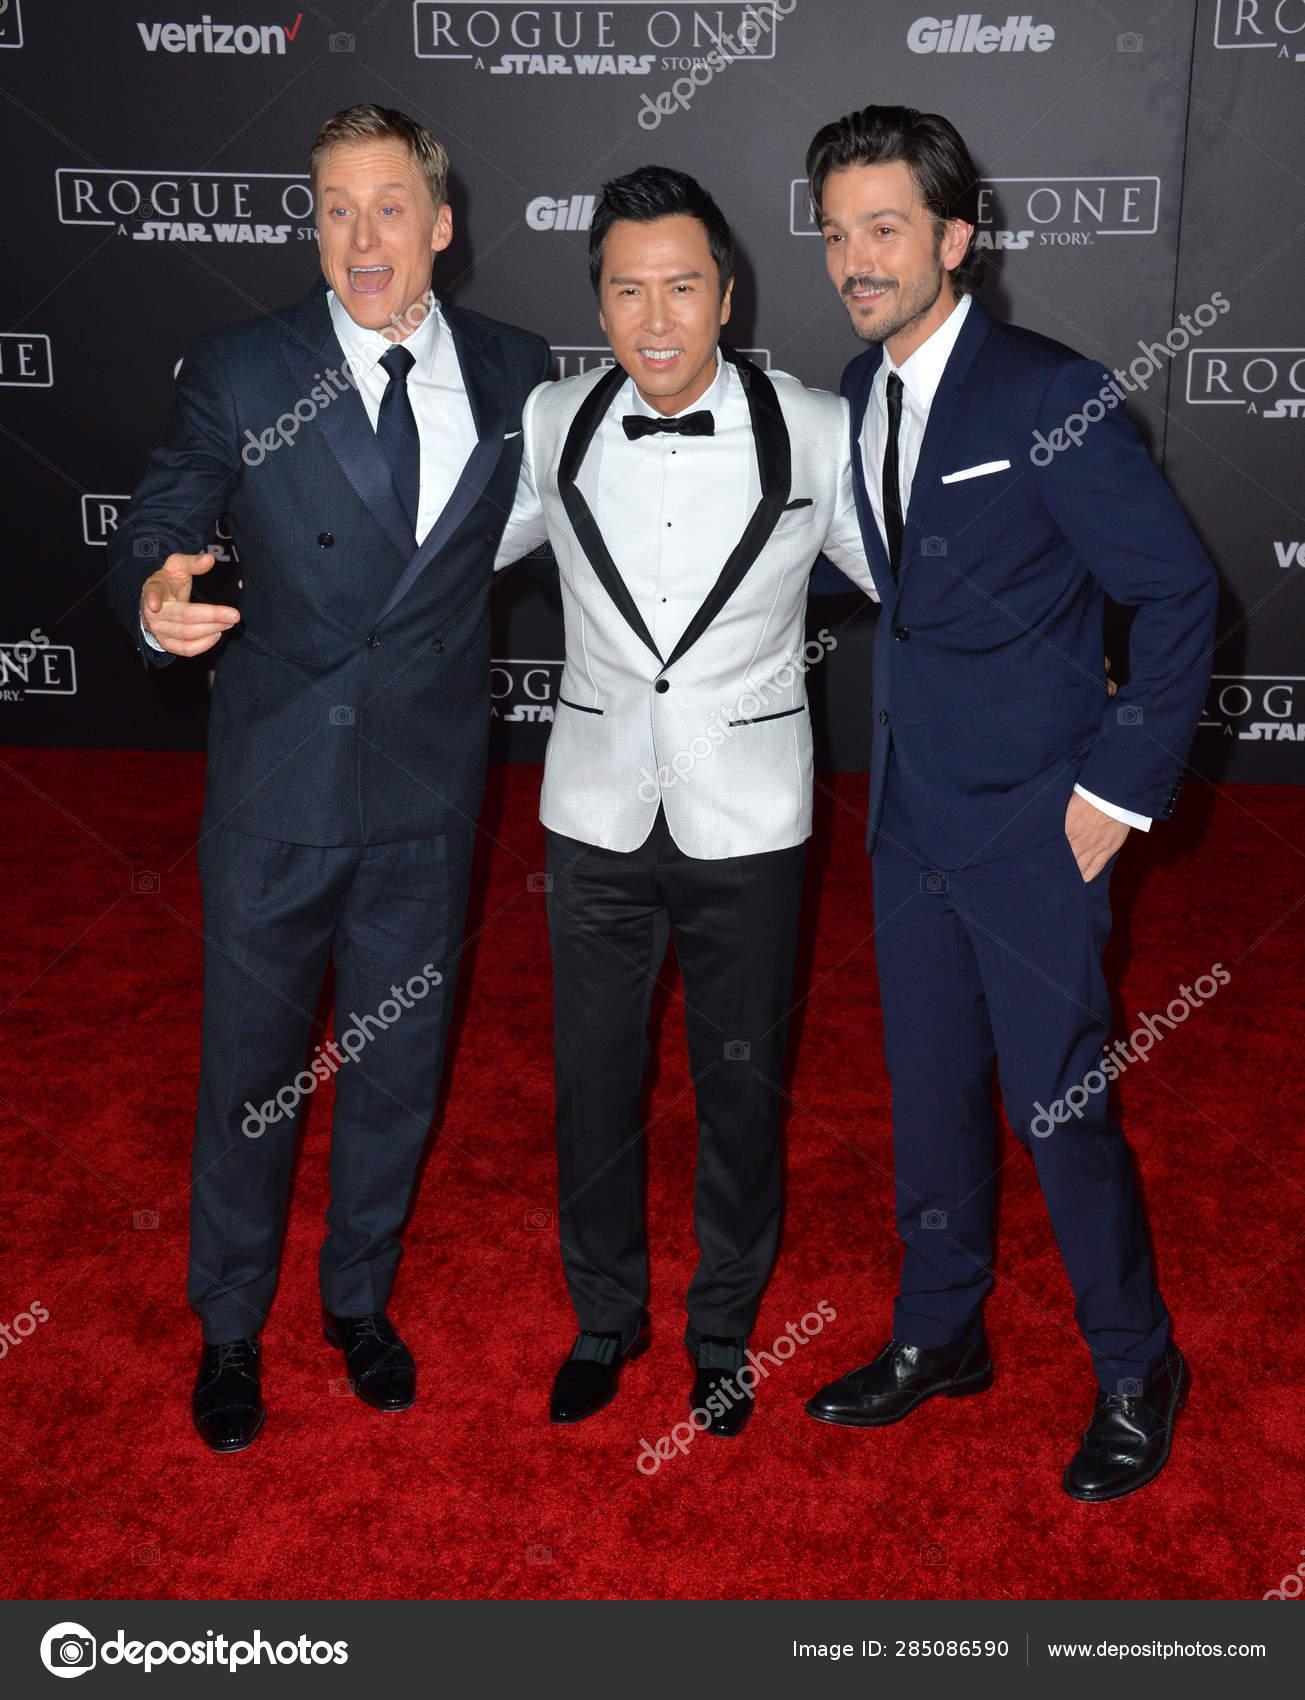 Alan Tudyk, Diego Luna & Donnie Yen – Stock Editorial Photo